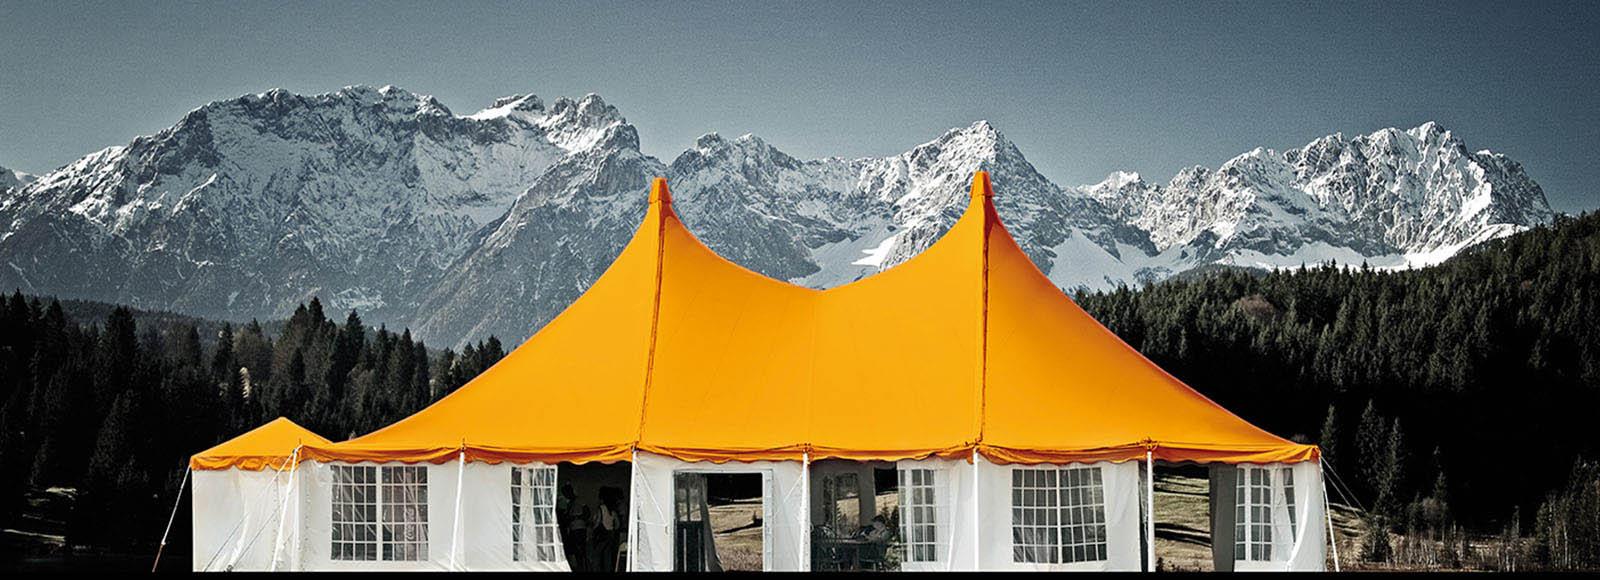 homebanner_heytex_tent